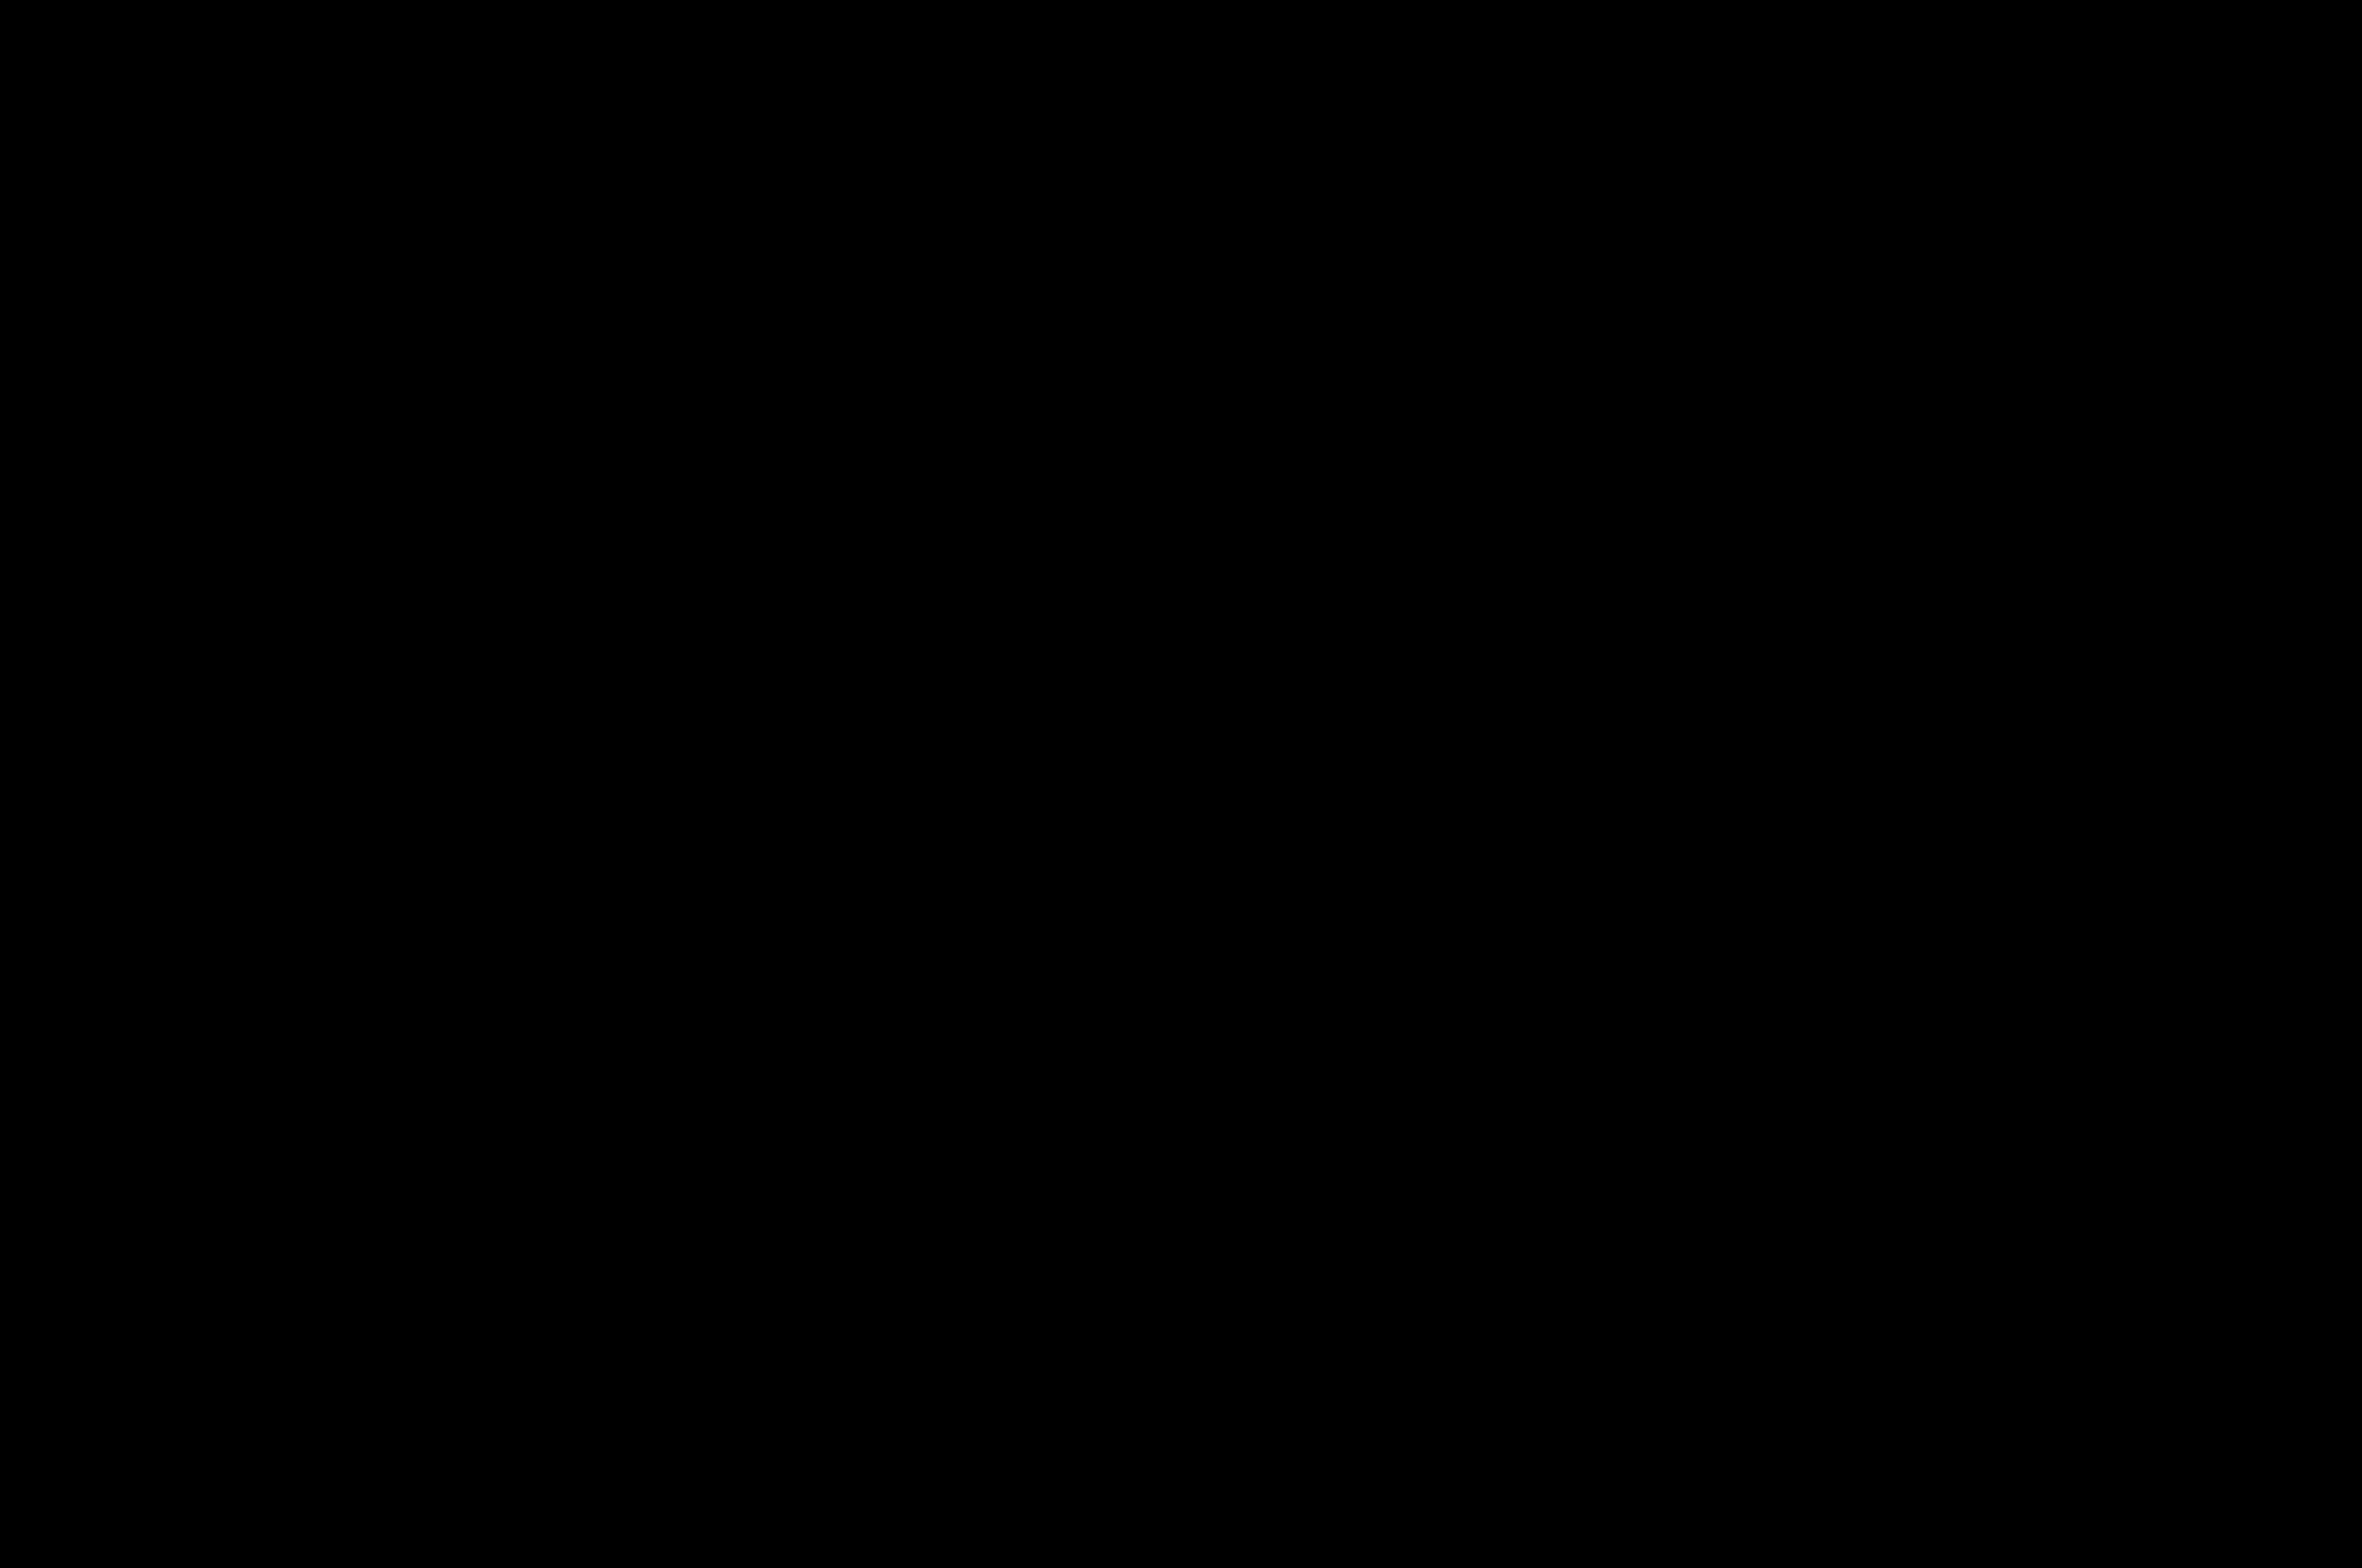 SEMI-FINALIST-SHIVER-BLACK-2018.png